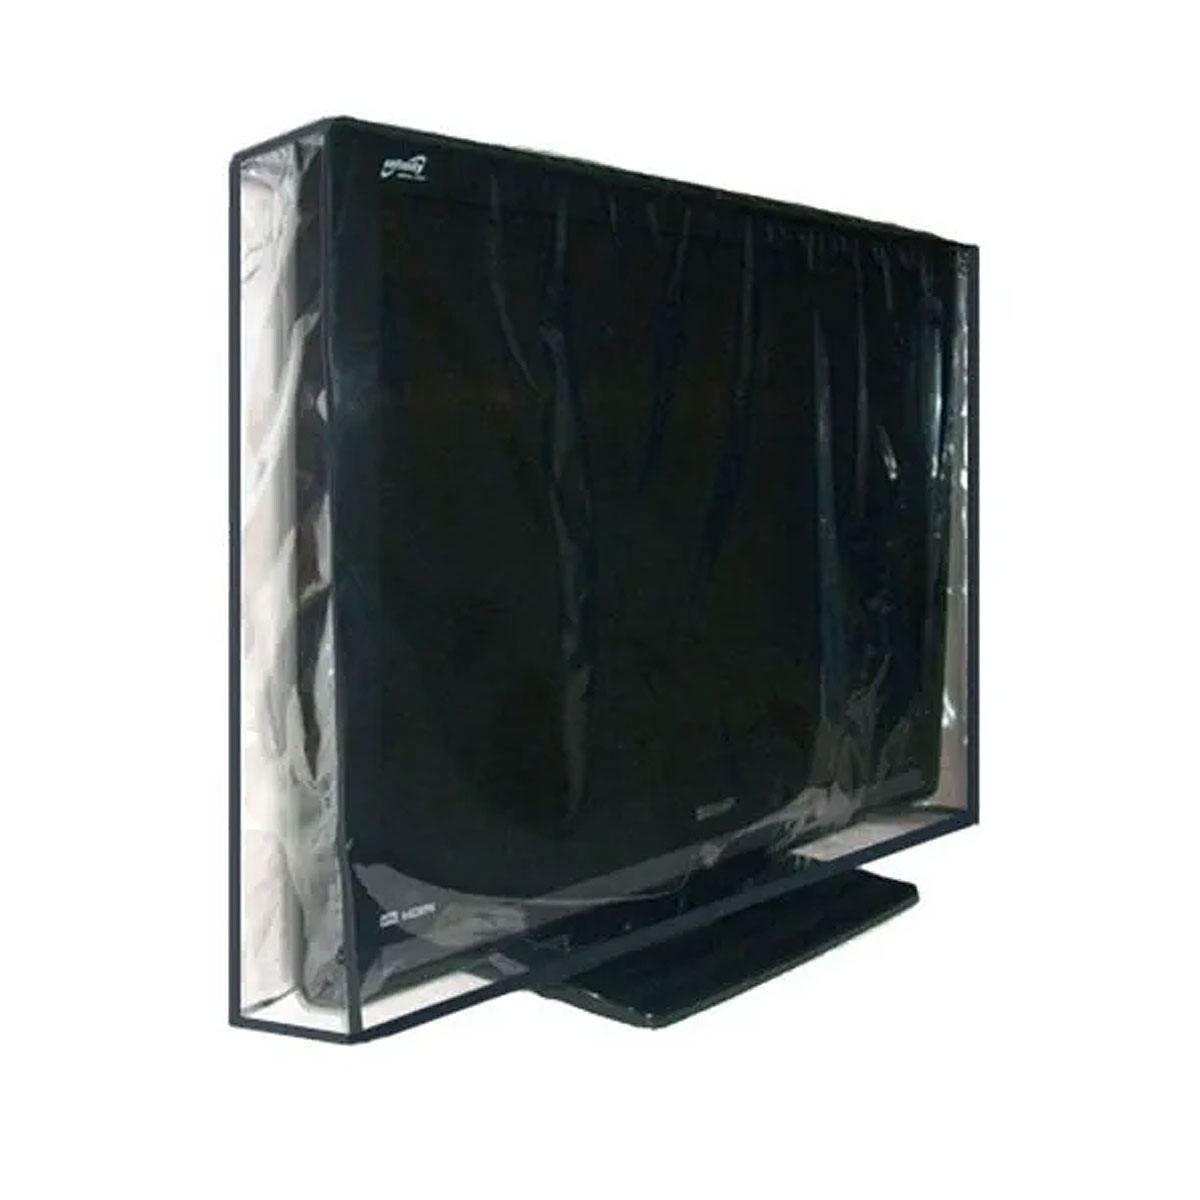 Capa Em Pvc Cristal Para Tv Led 26 - Aberta Atrás